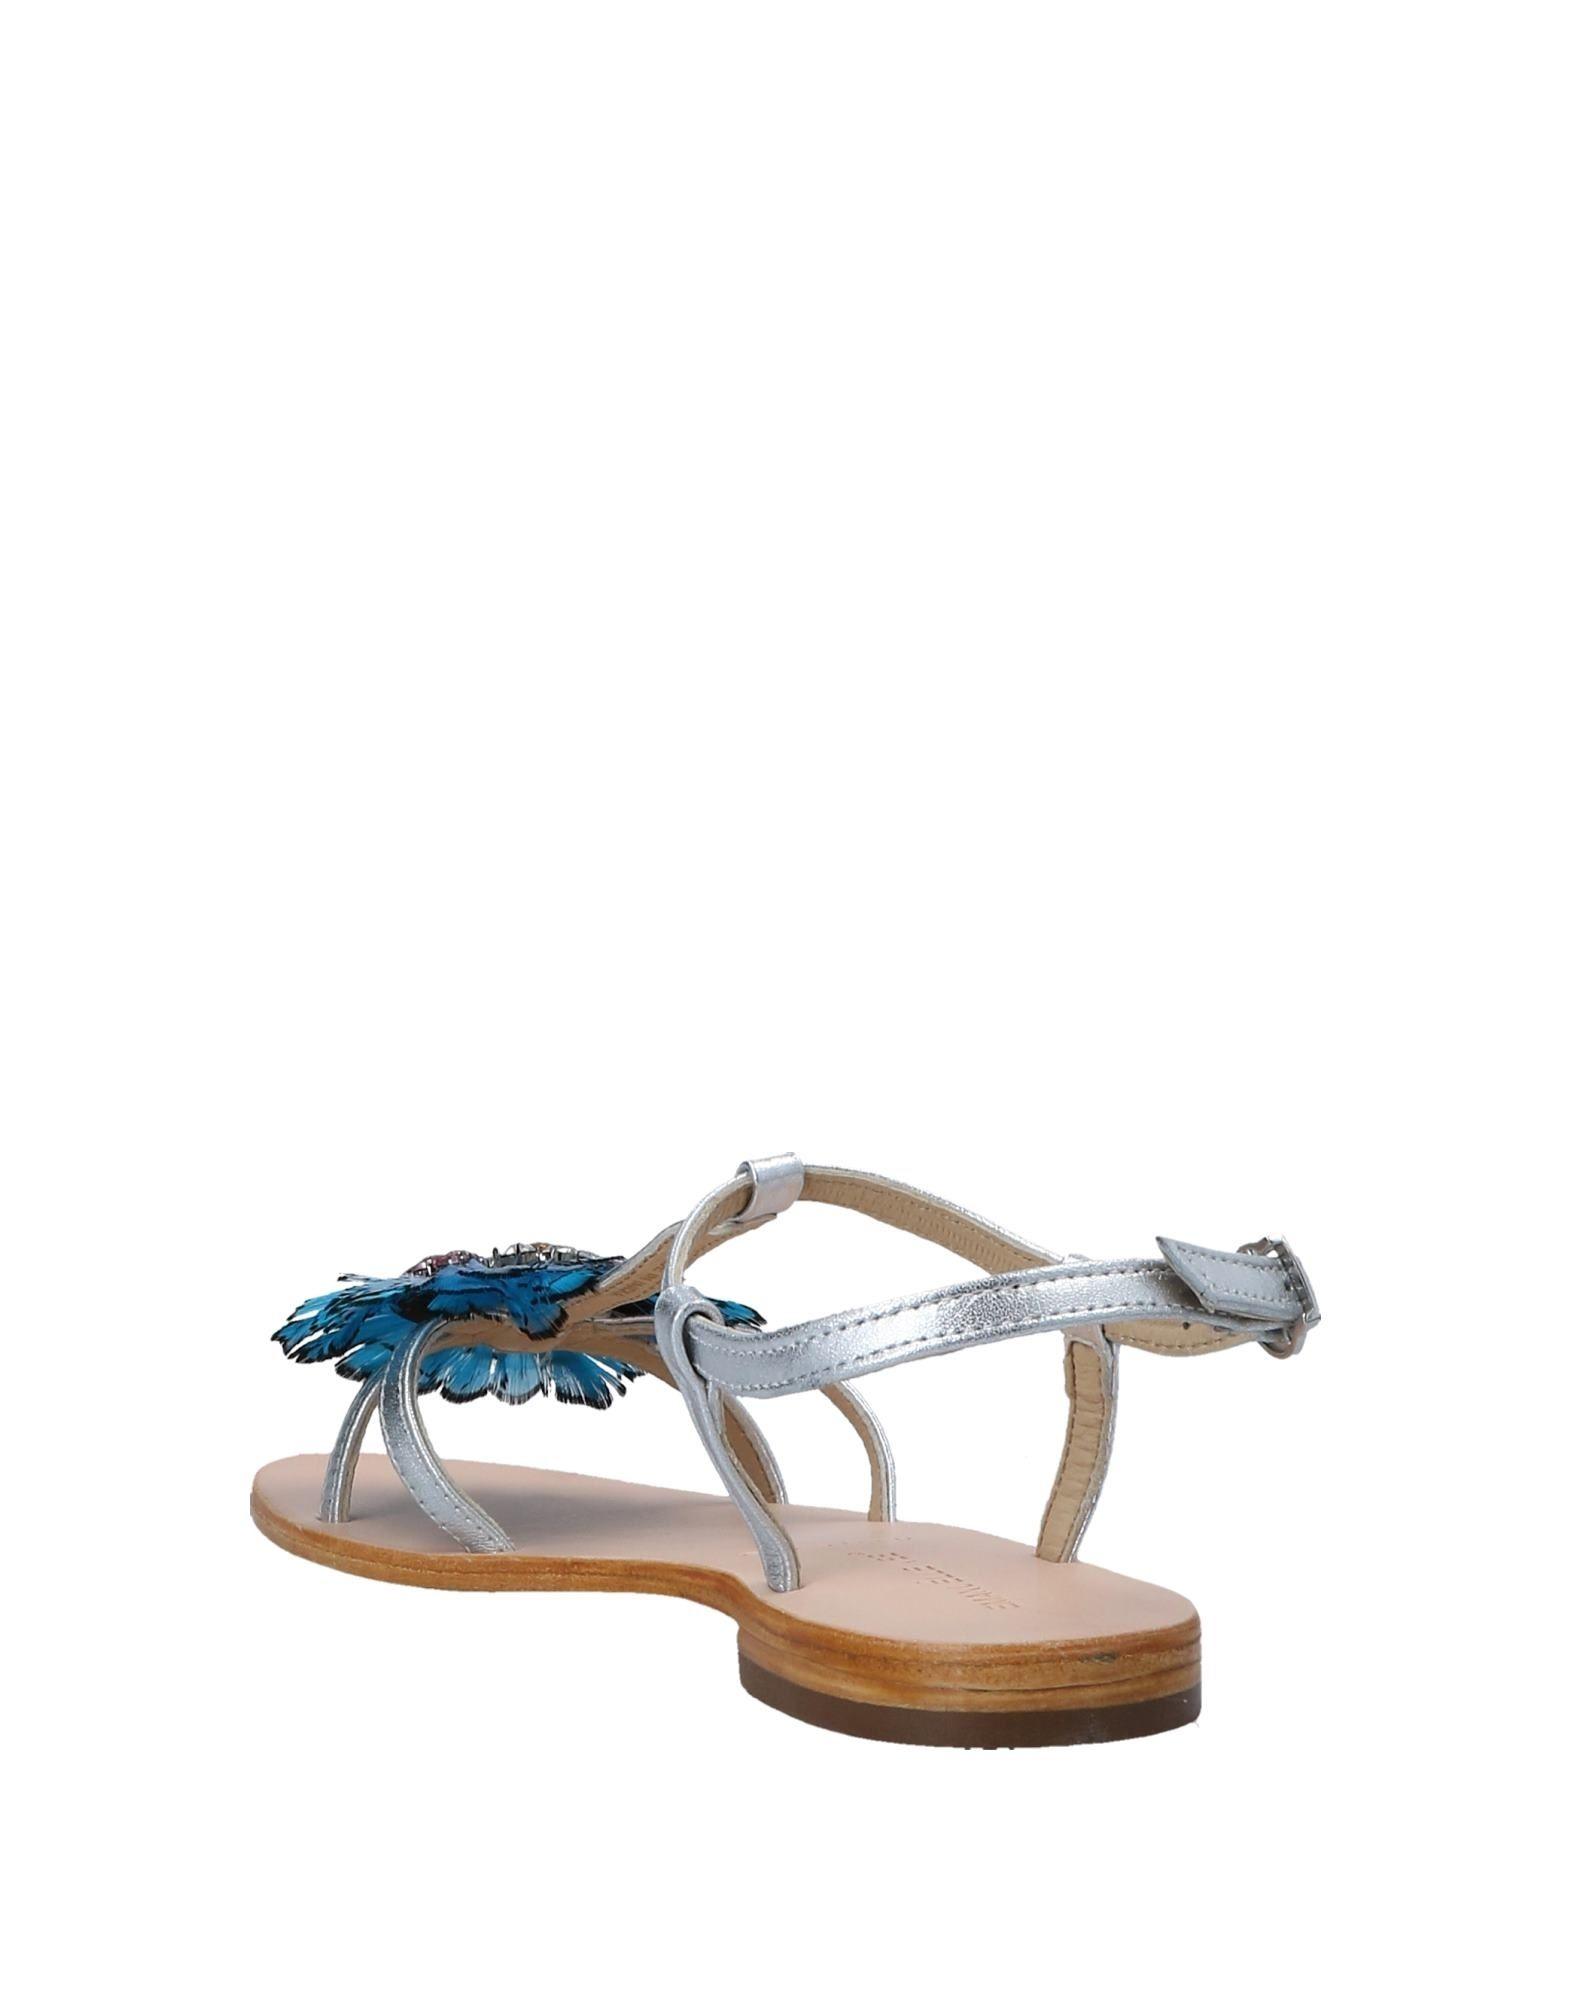 Emanuélle Vee Sandalen Damen  Schuhe 11559023CU Gute Qualität beliebte Schuhe  64ecc4